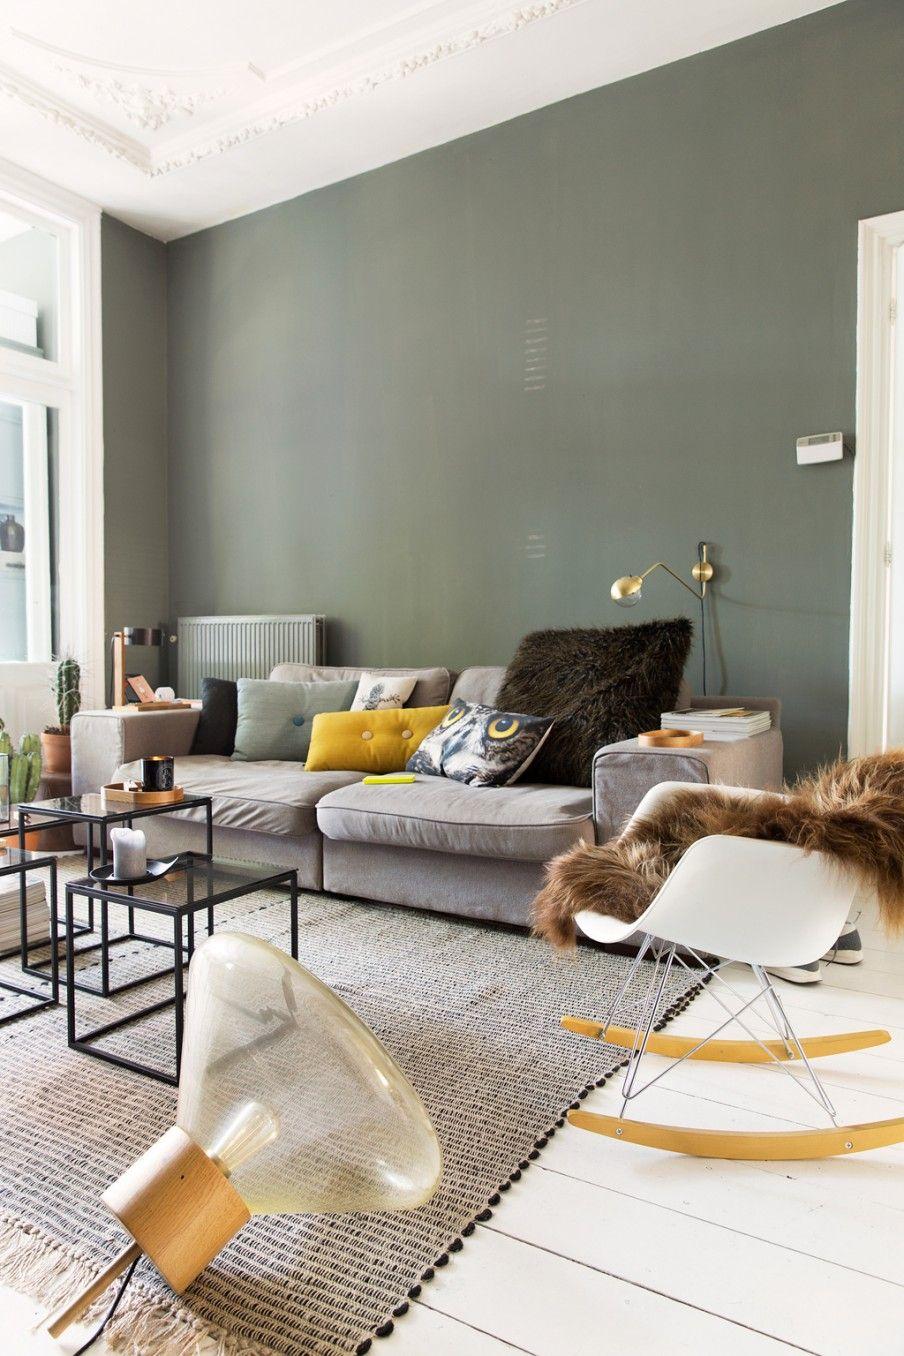 grijsgroene kleur op muur | Fregat in 2018 | Pinterest | Interieur ...